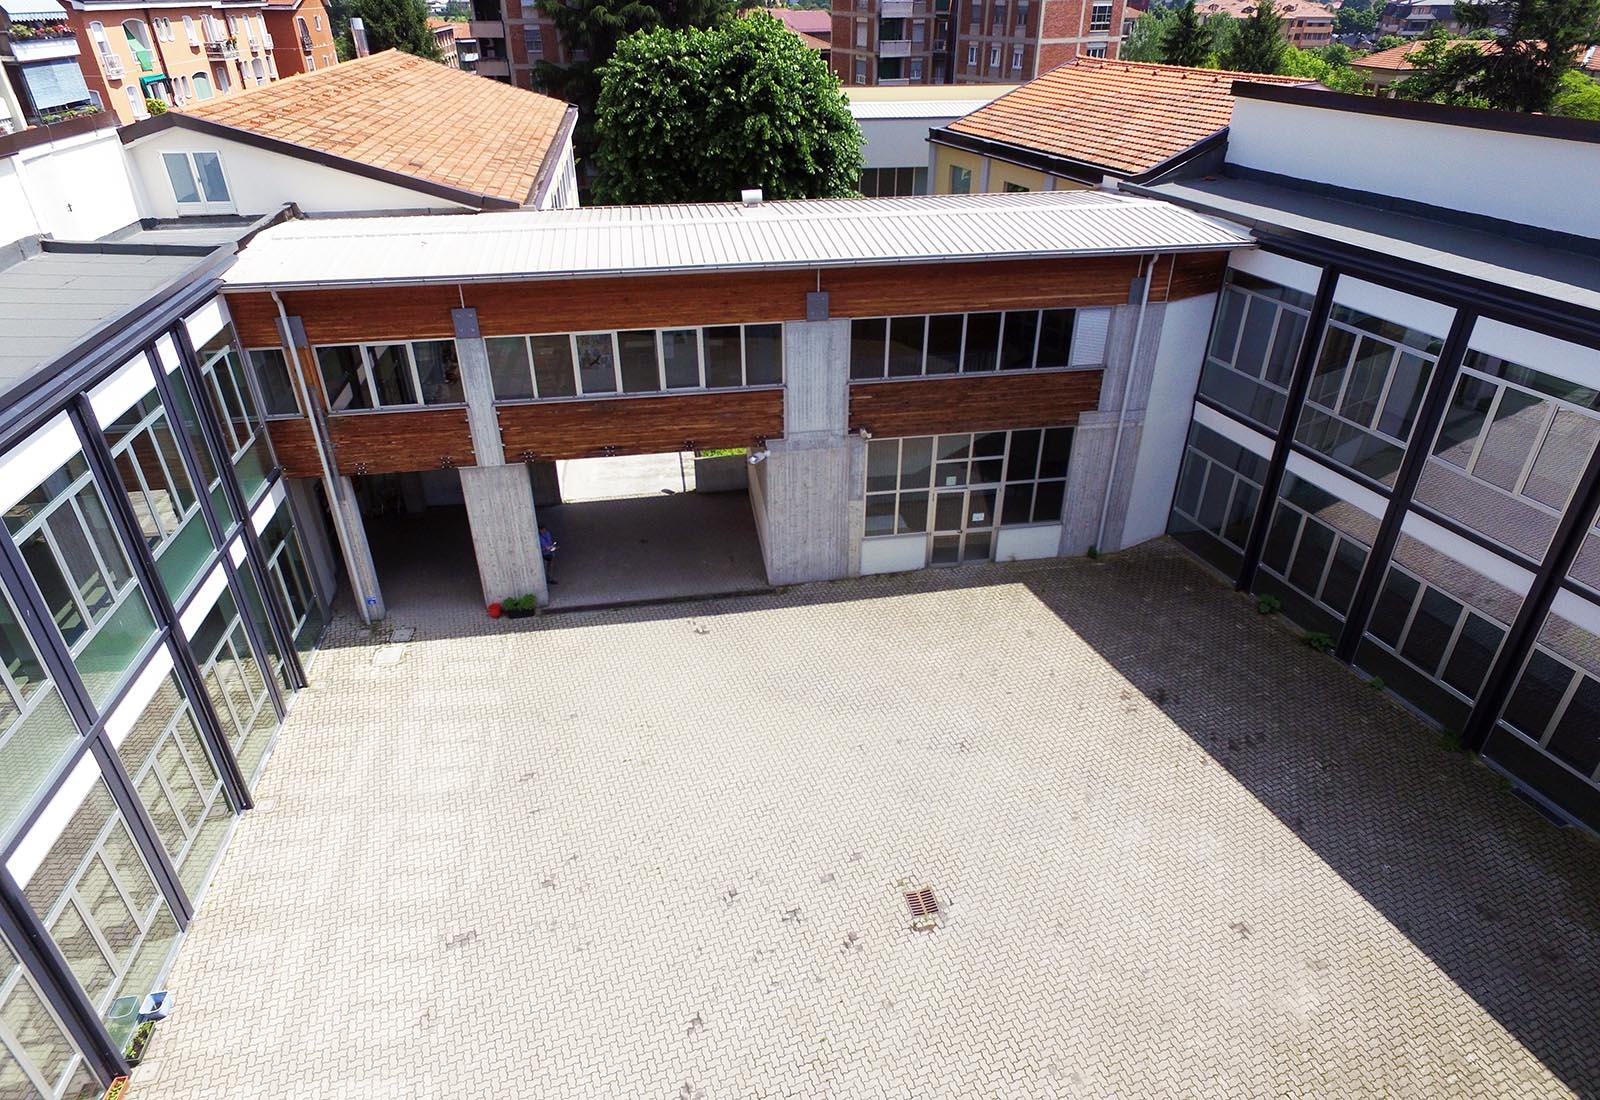 Poliplesso scolastico a Melegnano - Vista